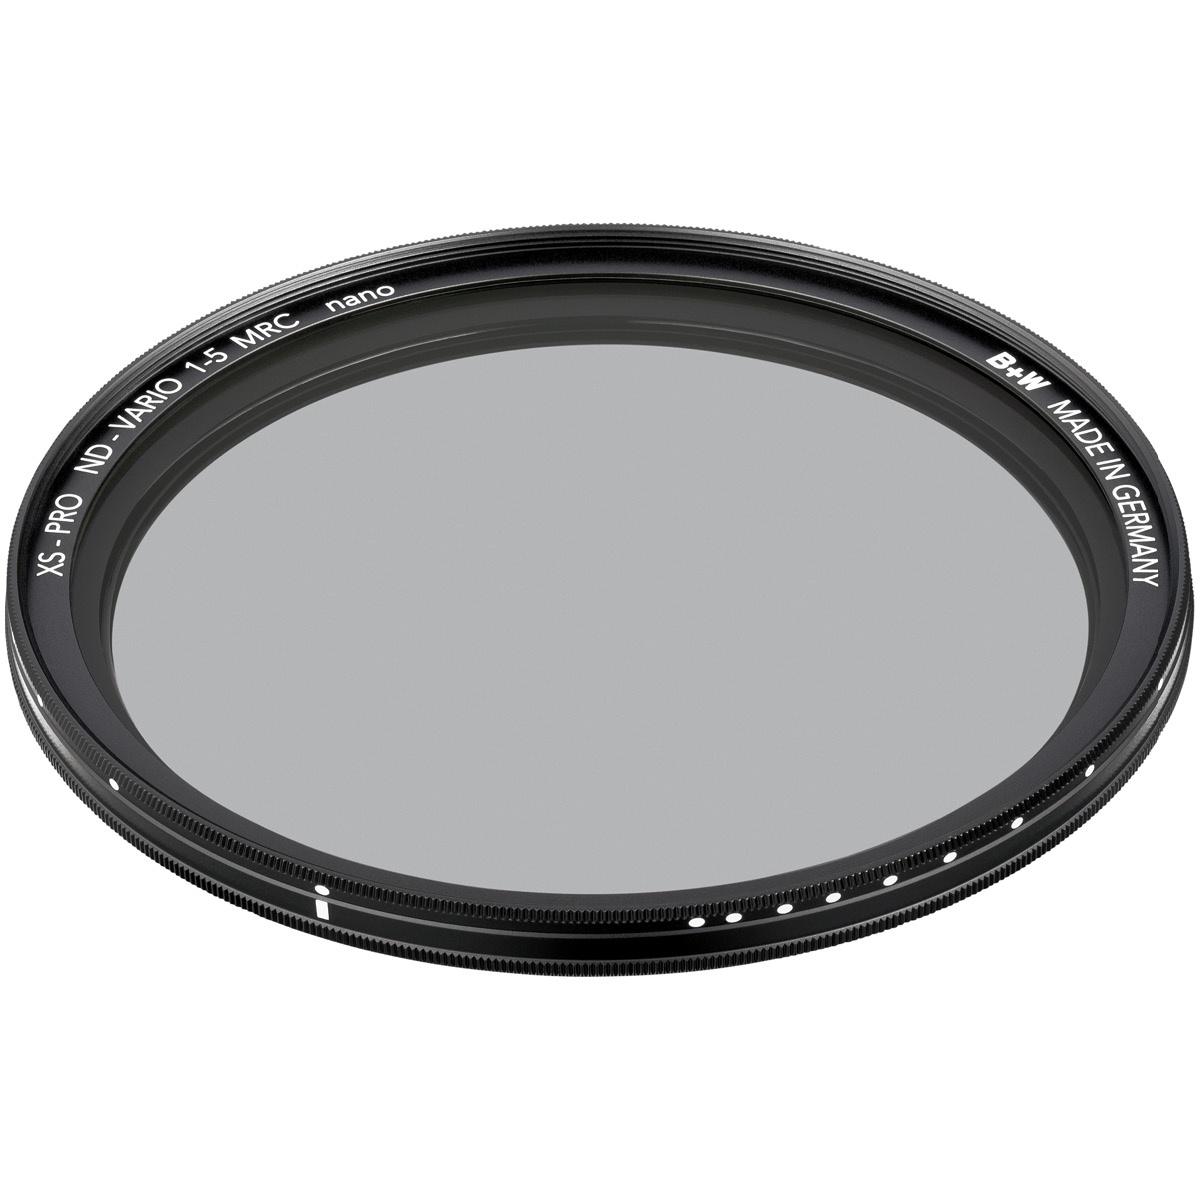 B+W Graufilter 62 mm XS-Pro Vario +1 - +5